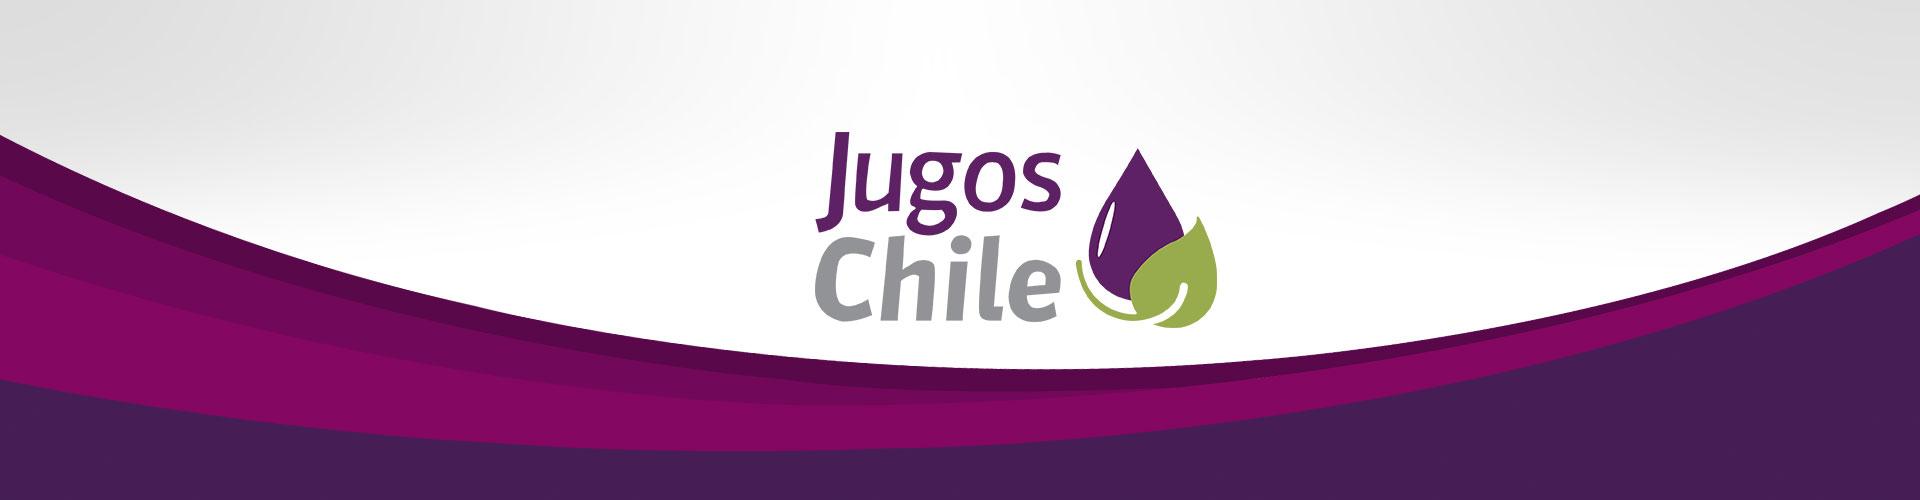 Jugos Chile